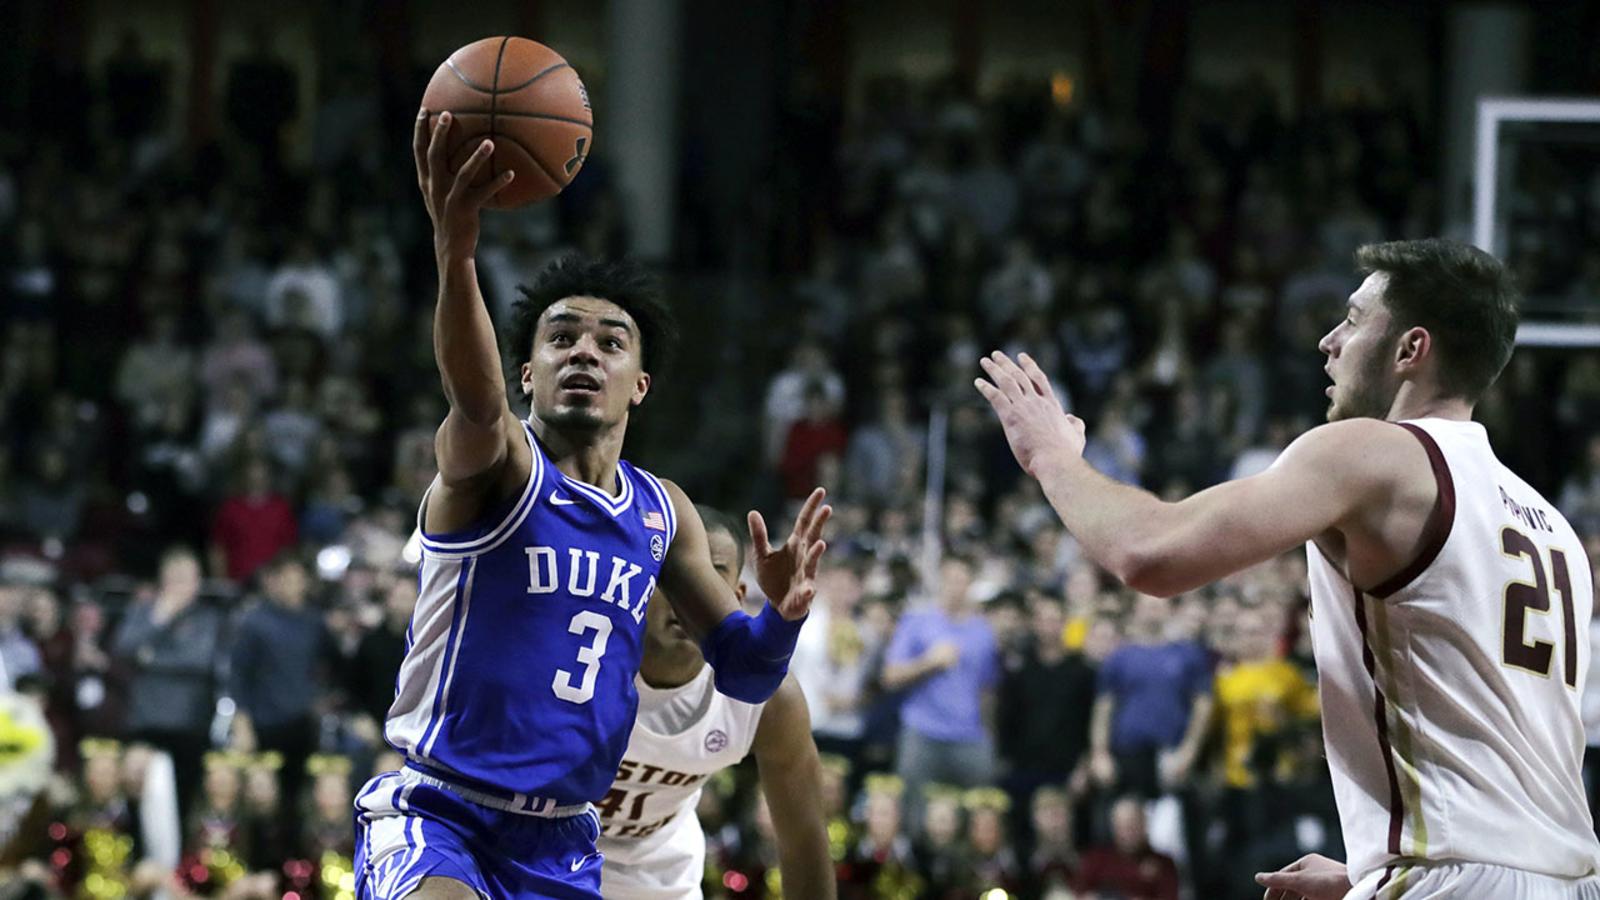 Sluggish No. 7 Duke rallies to beat Boston College 63-55